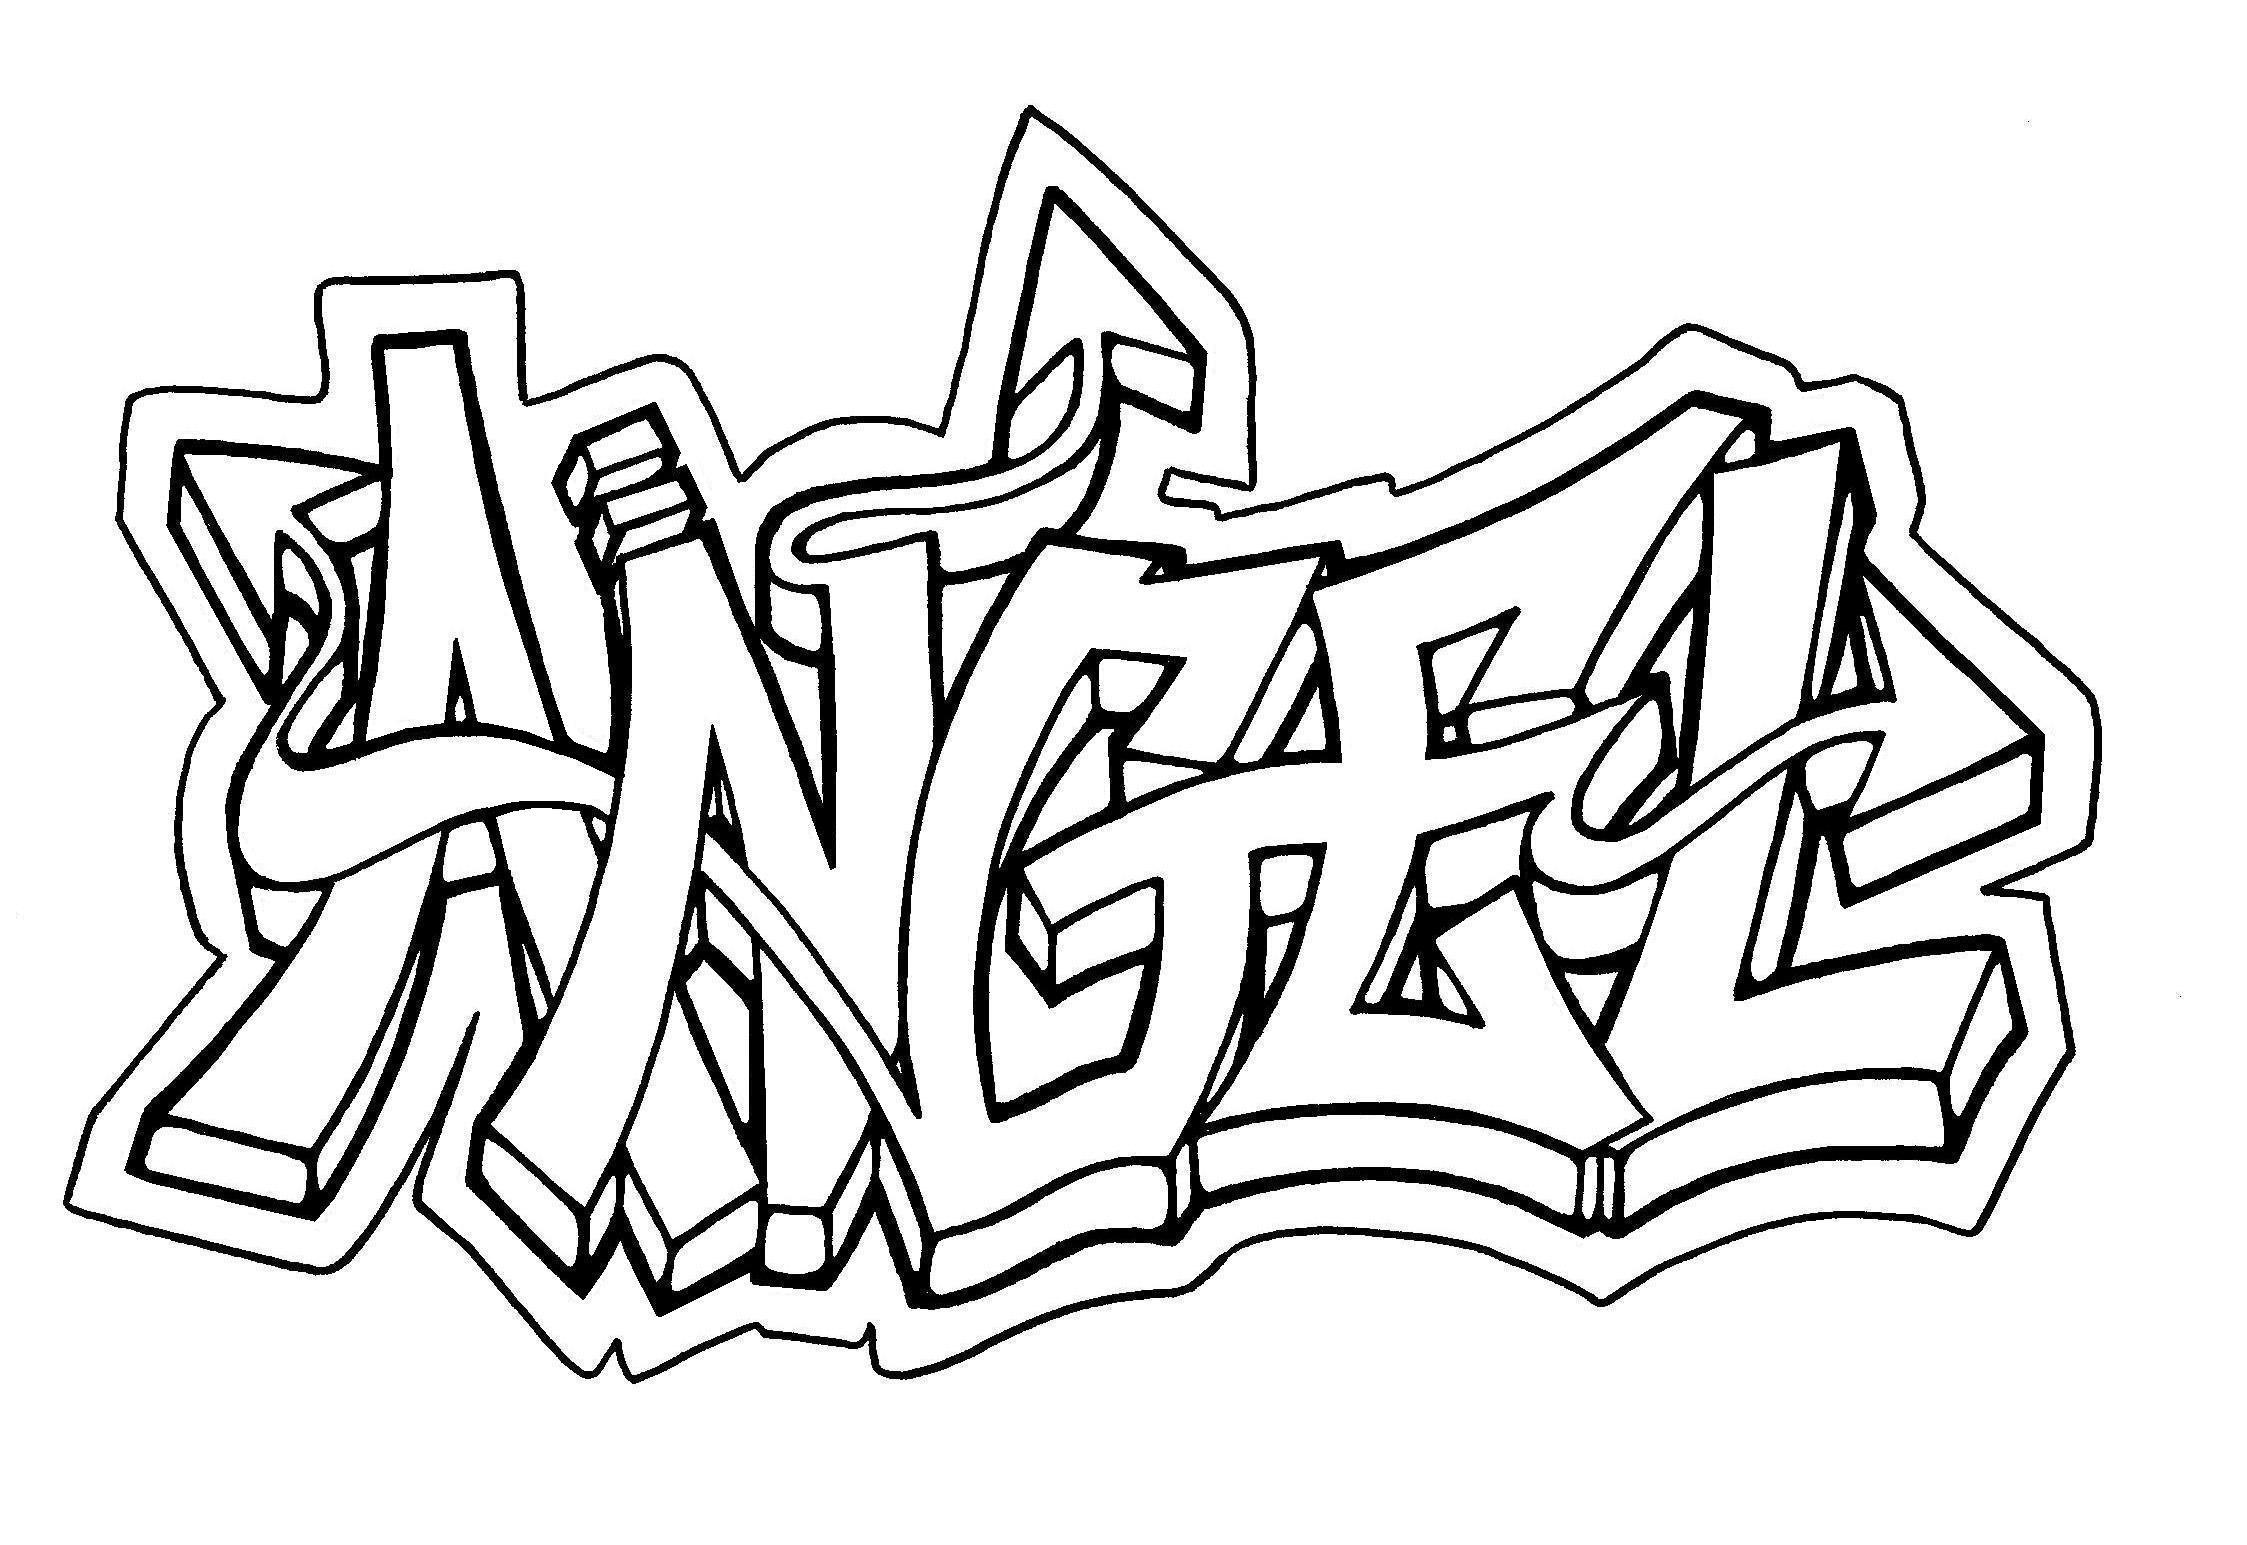 2247x1545 Graffiti Tag Drawings Cool Drawings Of Names Cool Graffiti Tag